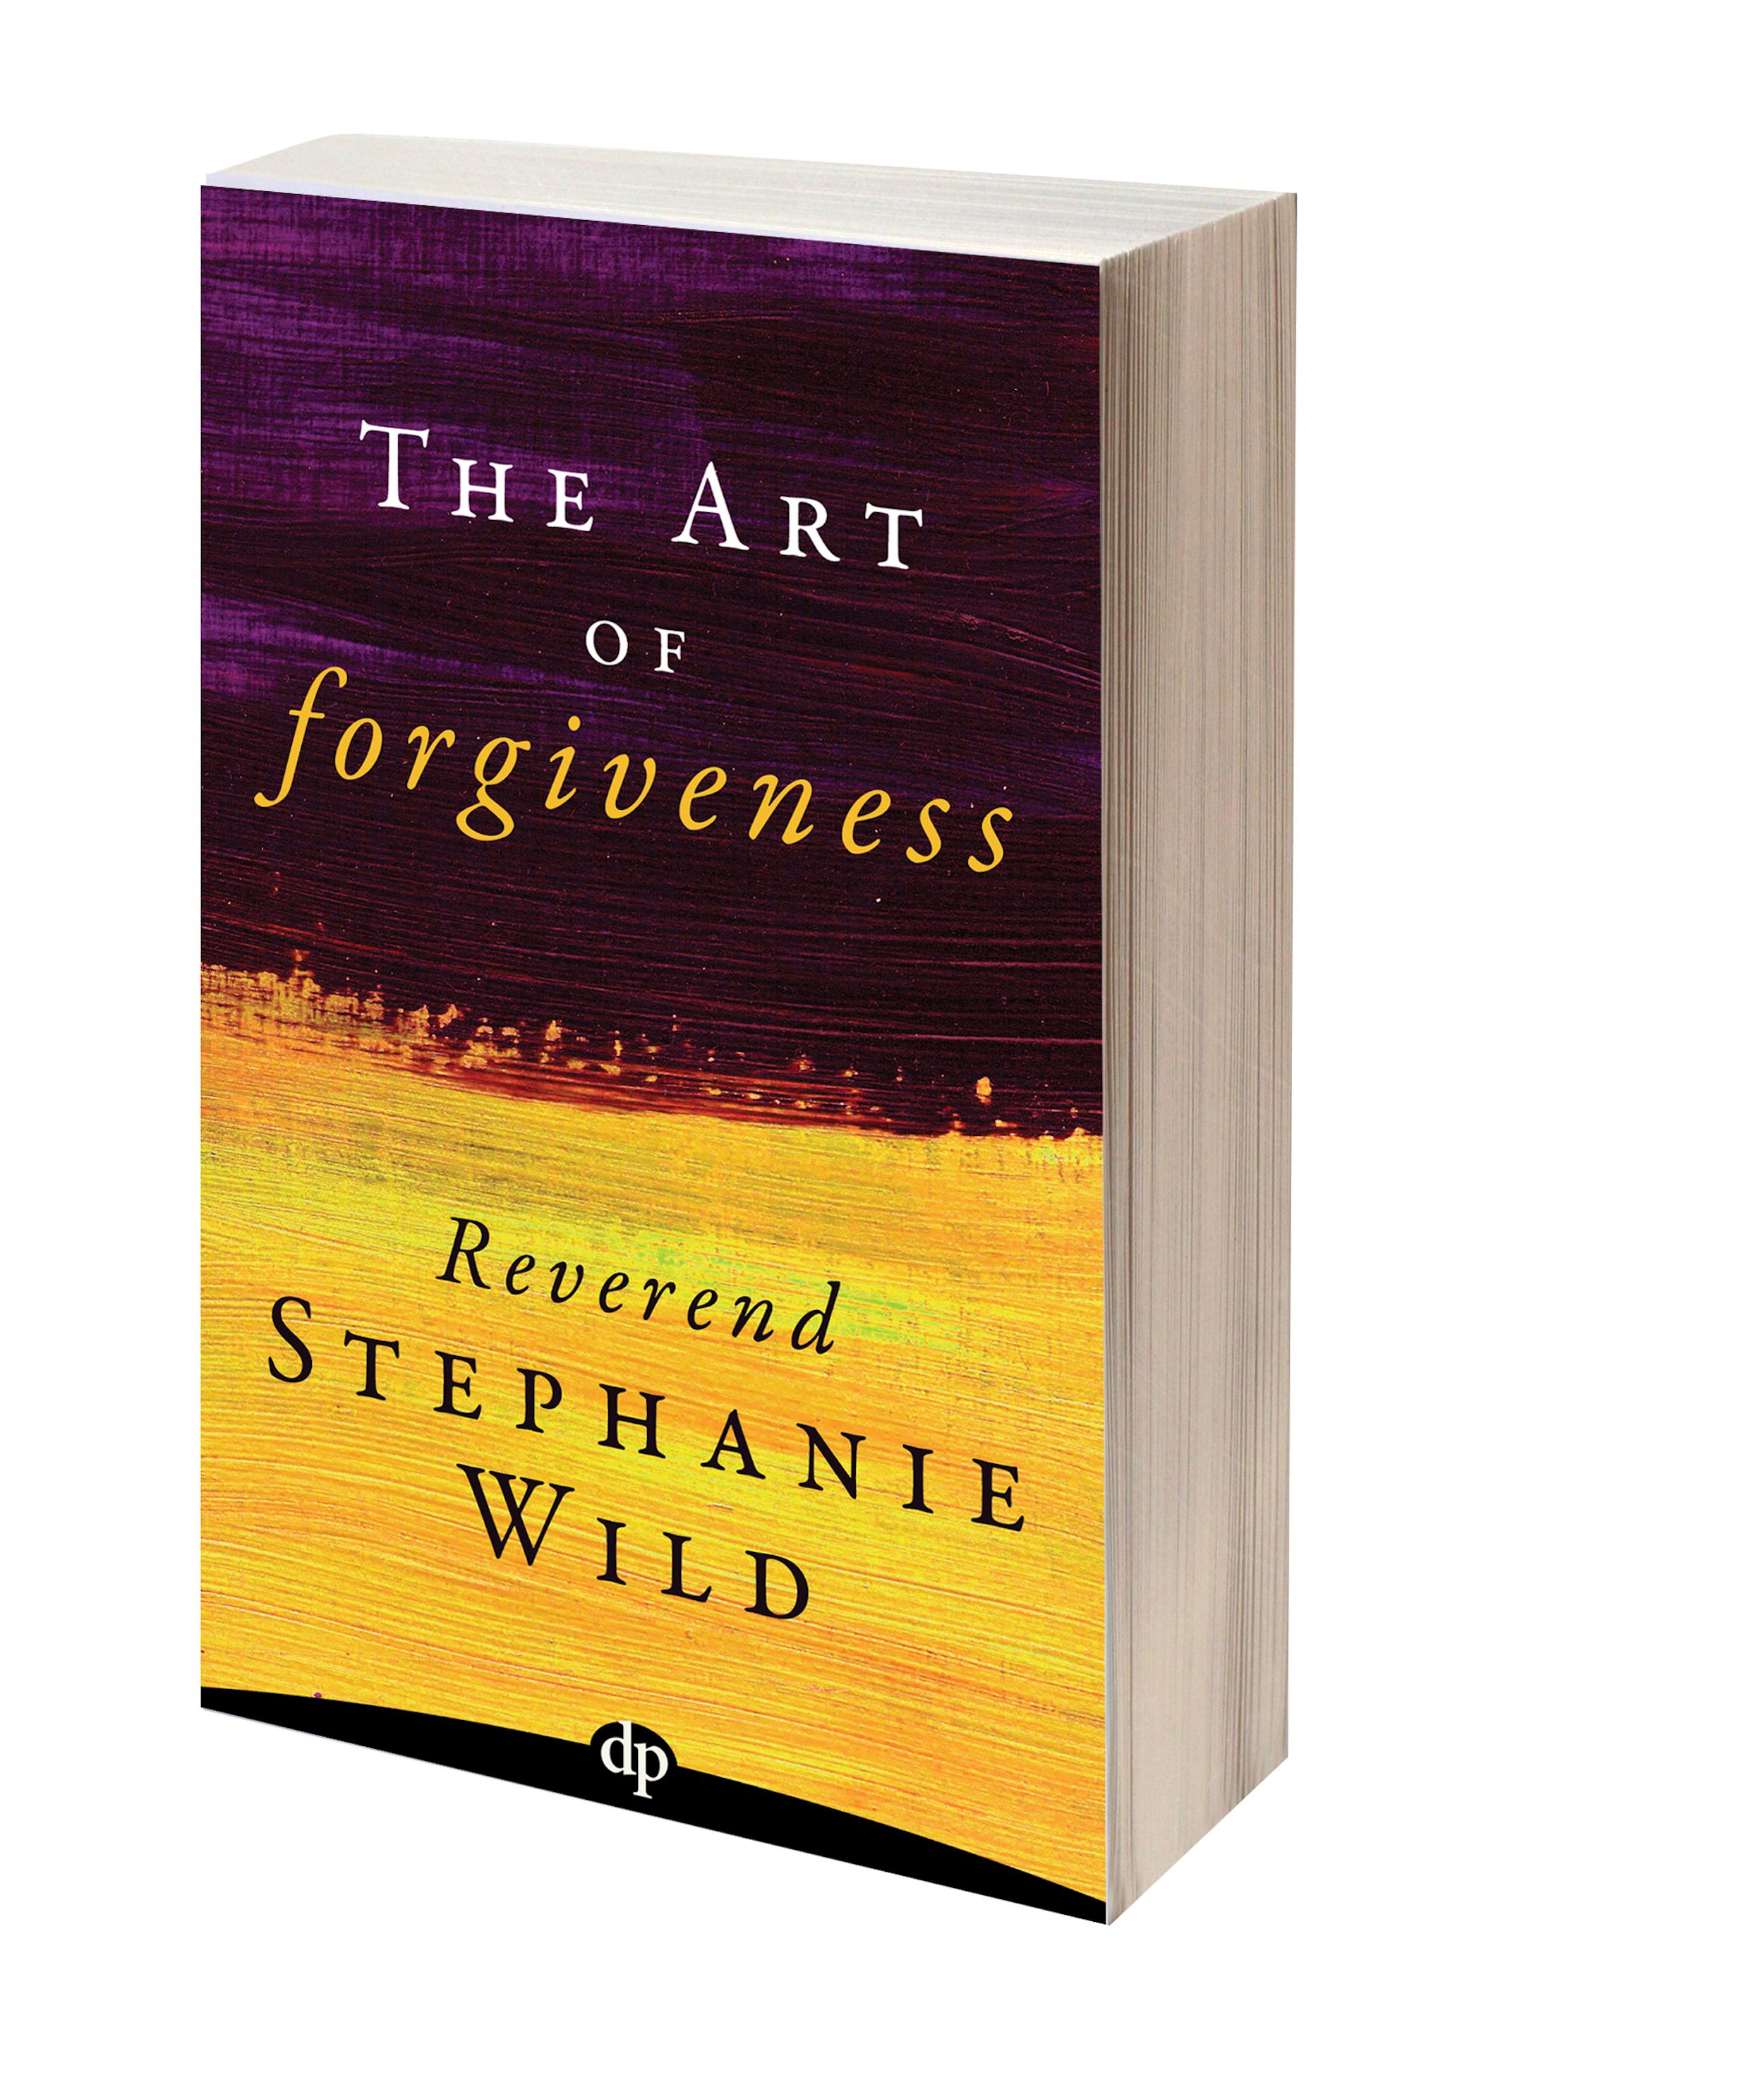 Wild_TheArtofForgiveness_3DBook.jpg